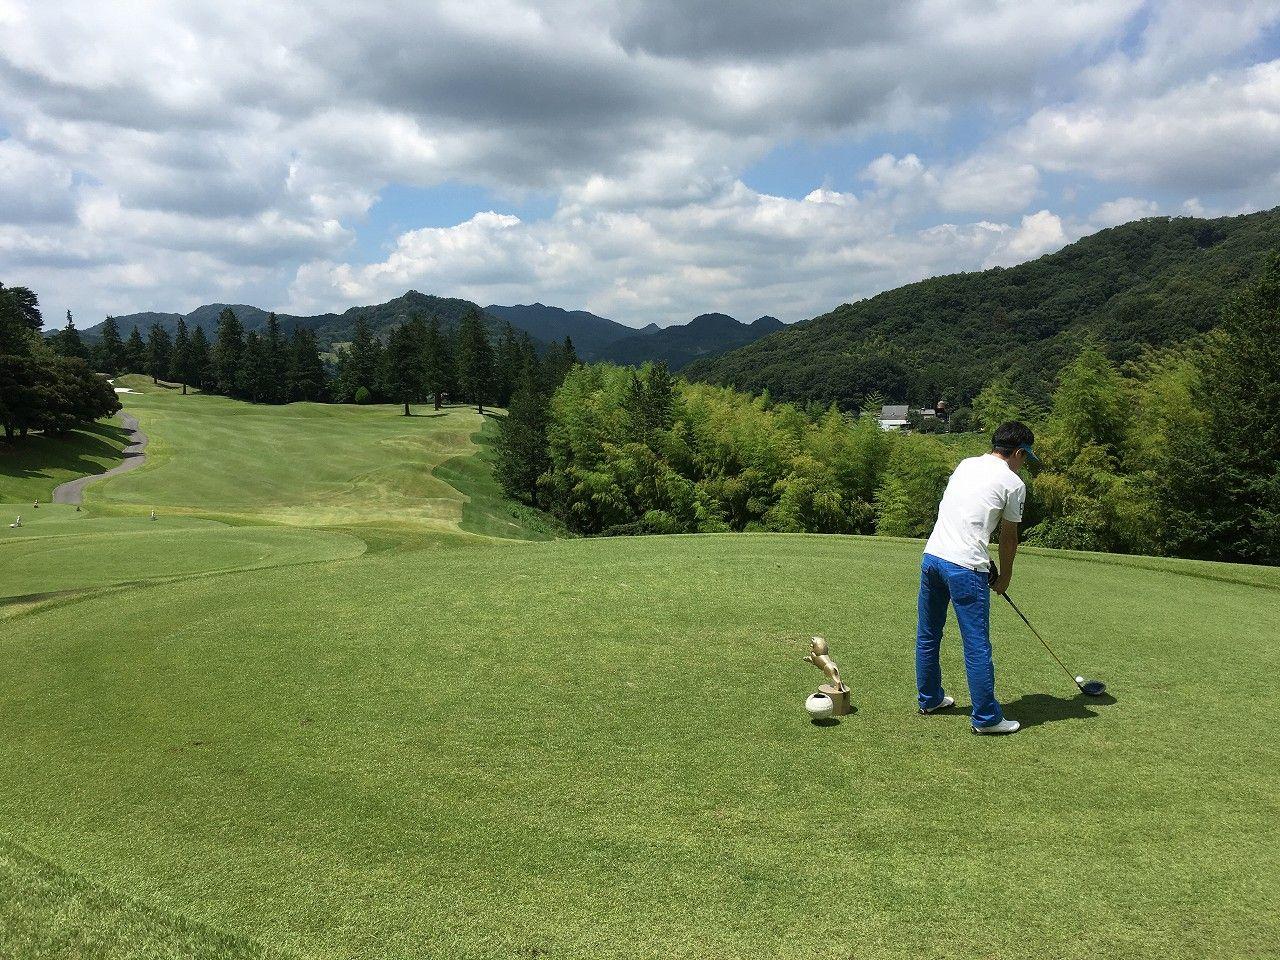 29 第二回幼馴染ゴルフ大会 6